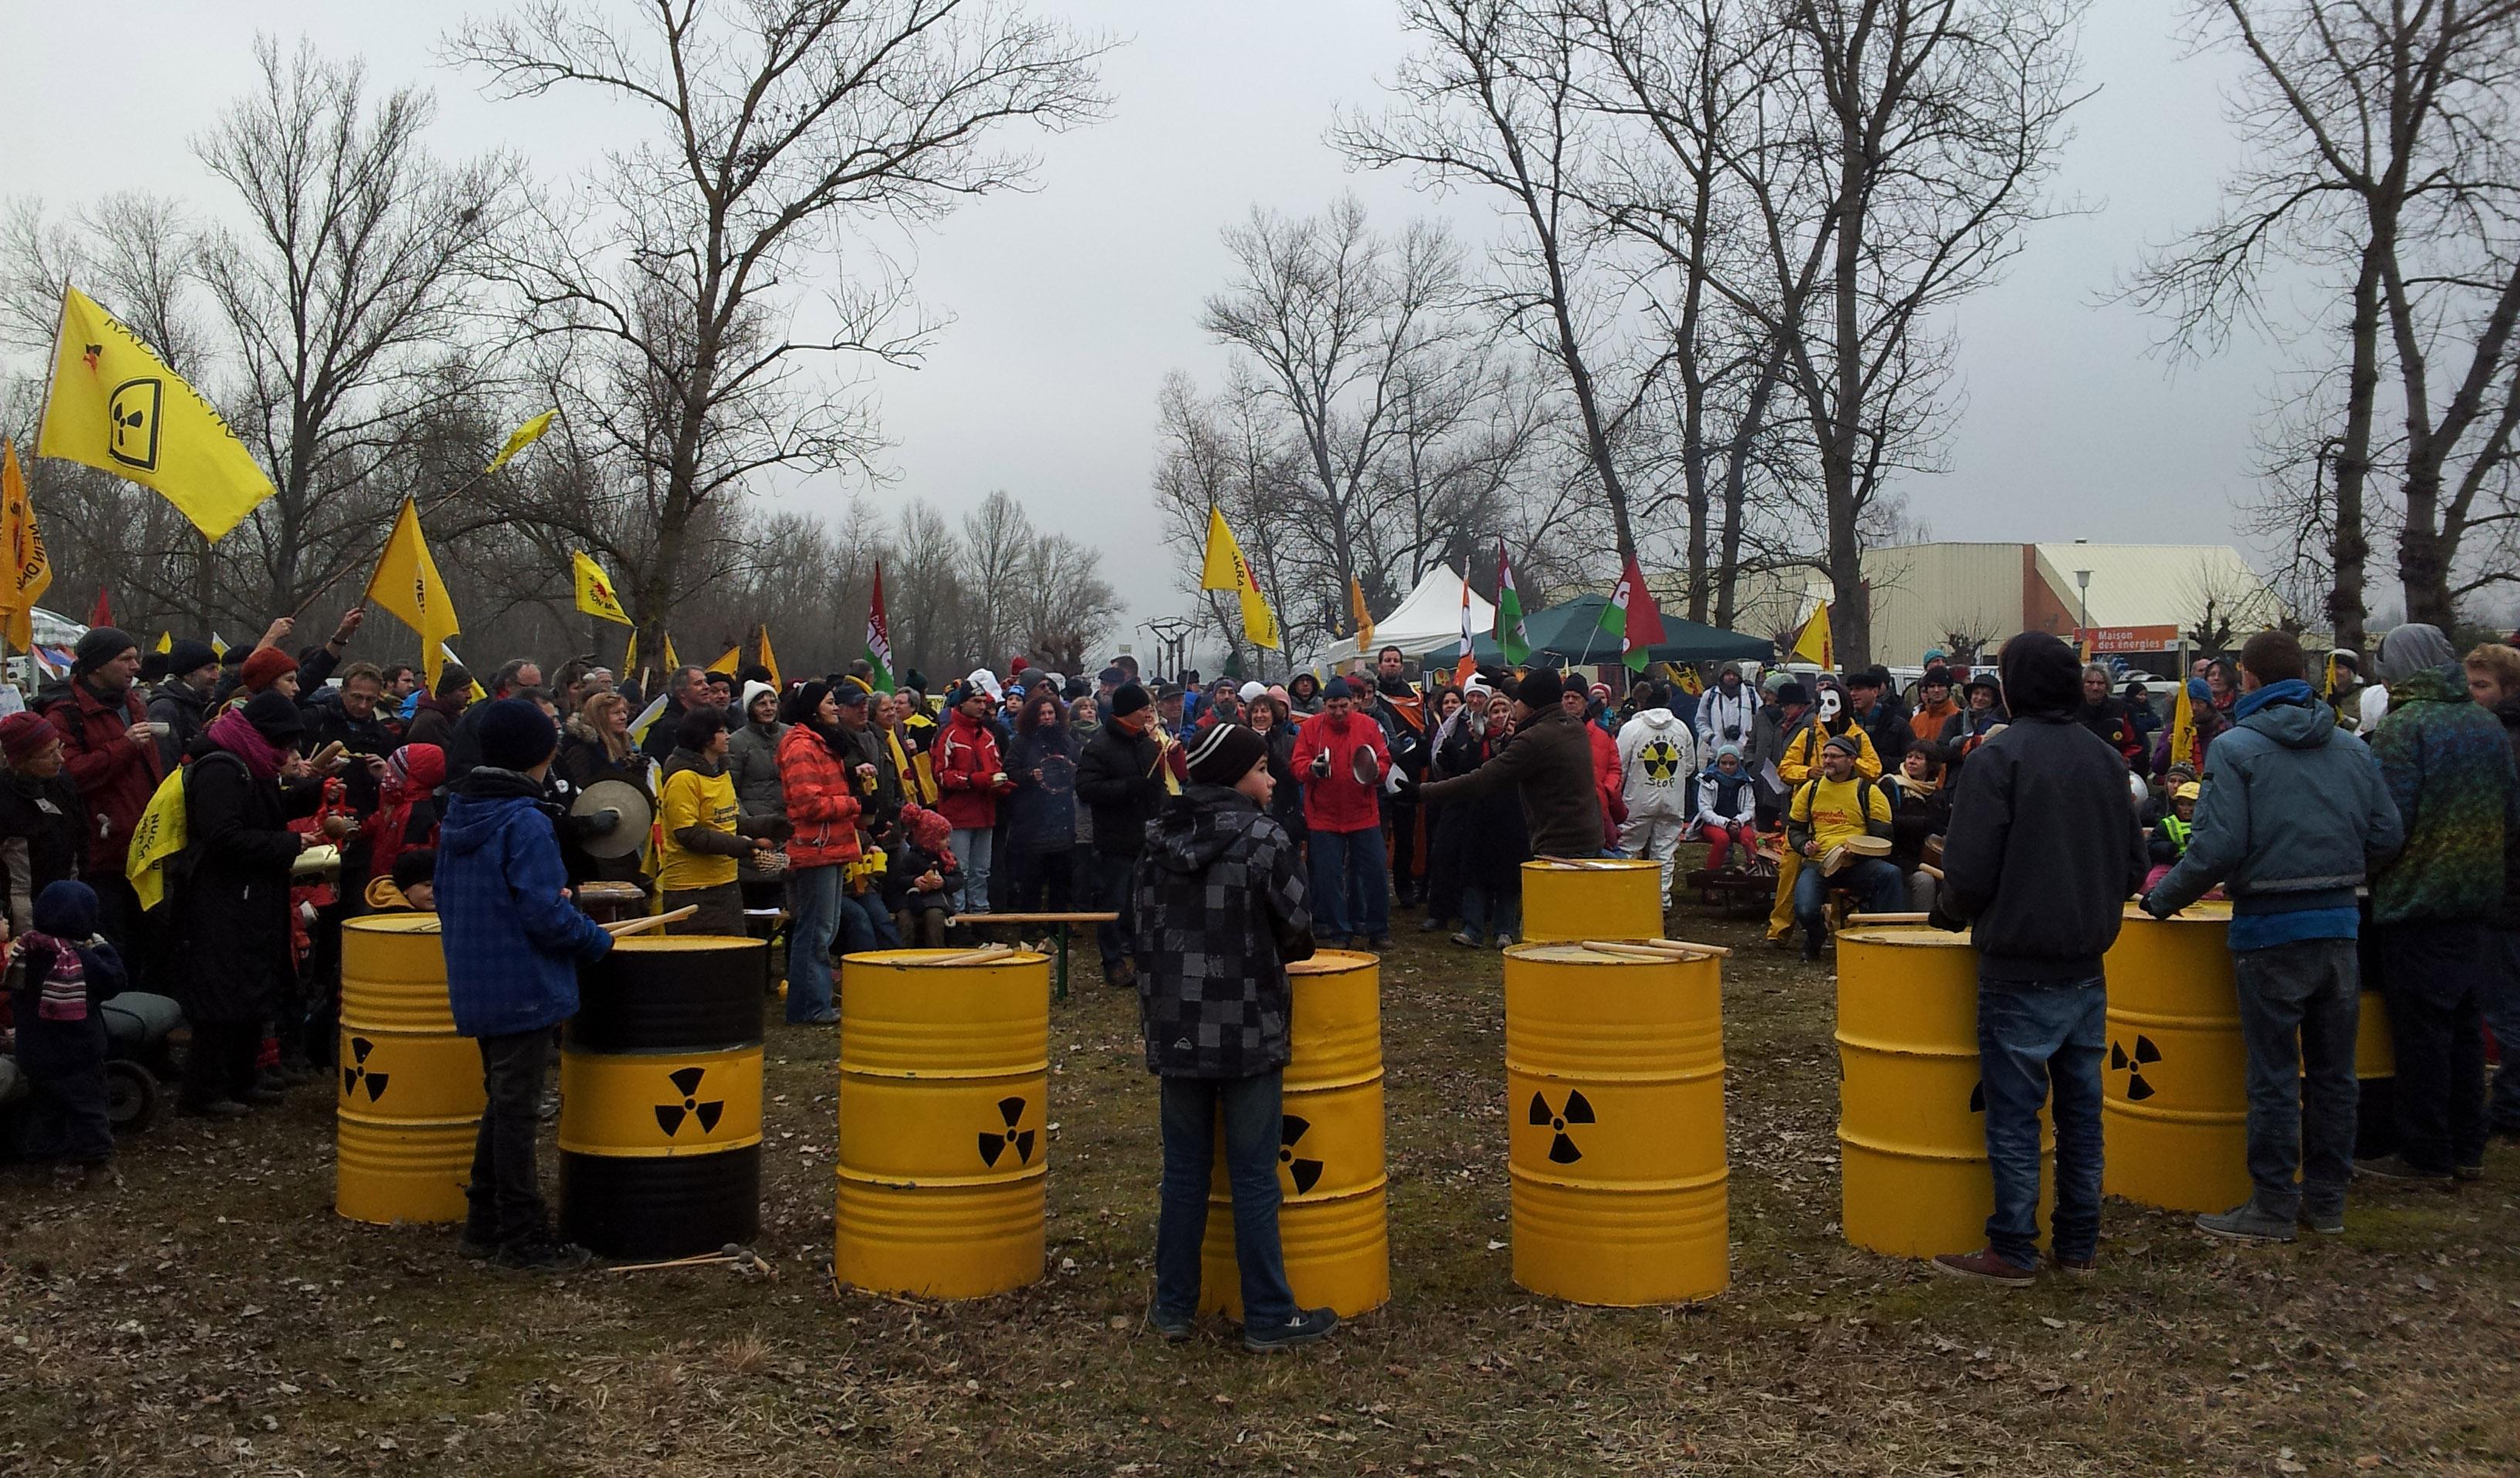 File:Protest against Fessenheim nuclear power plant 07.jpg